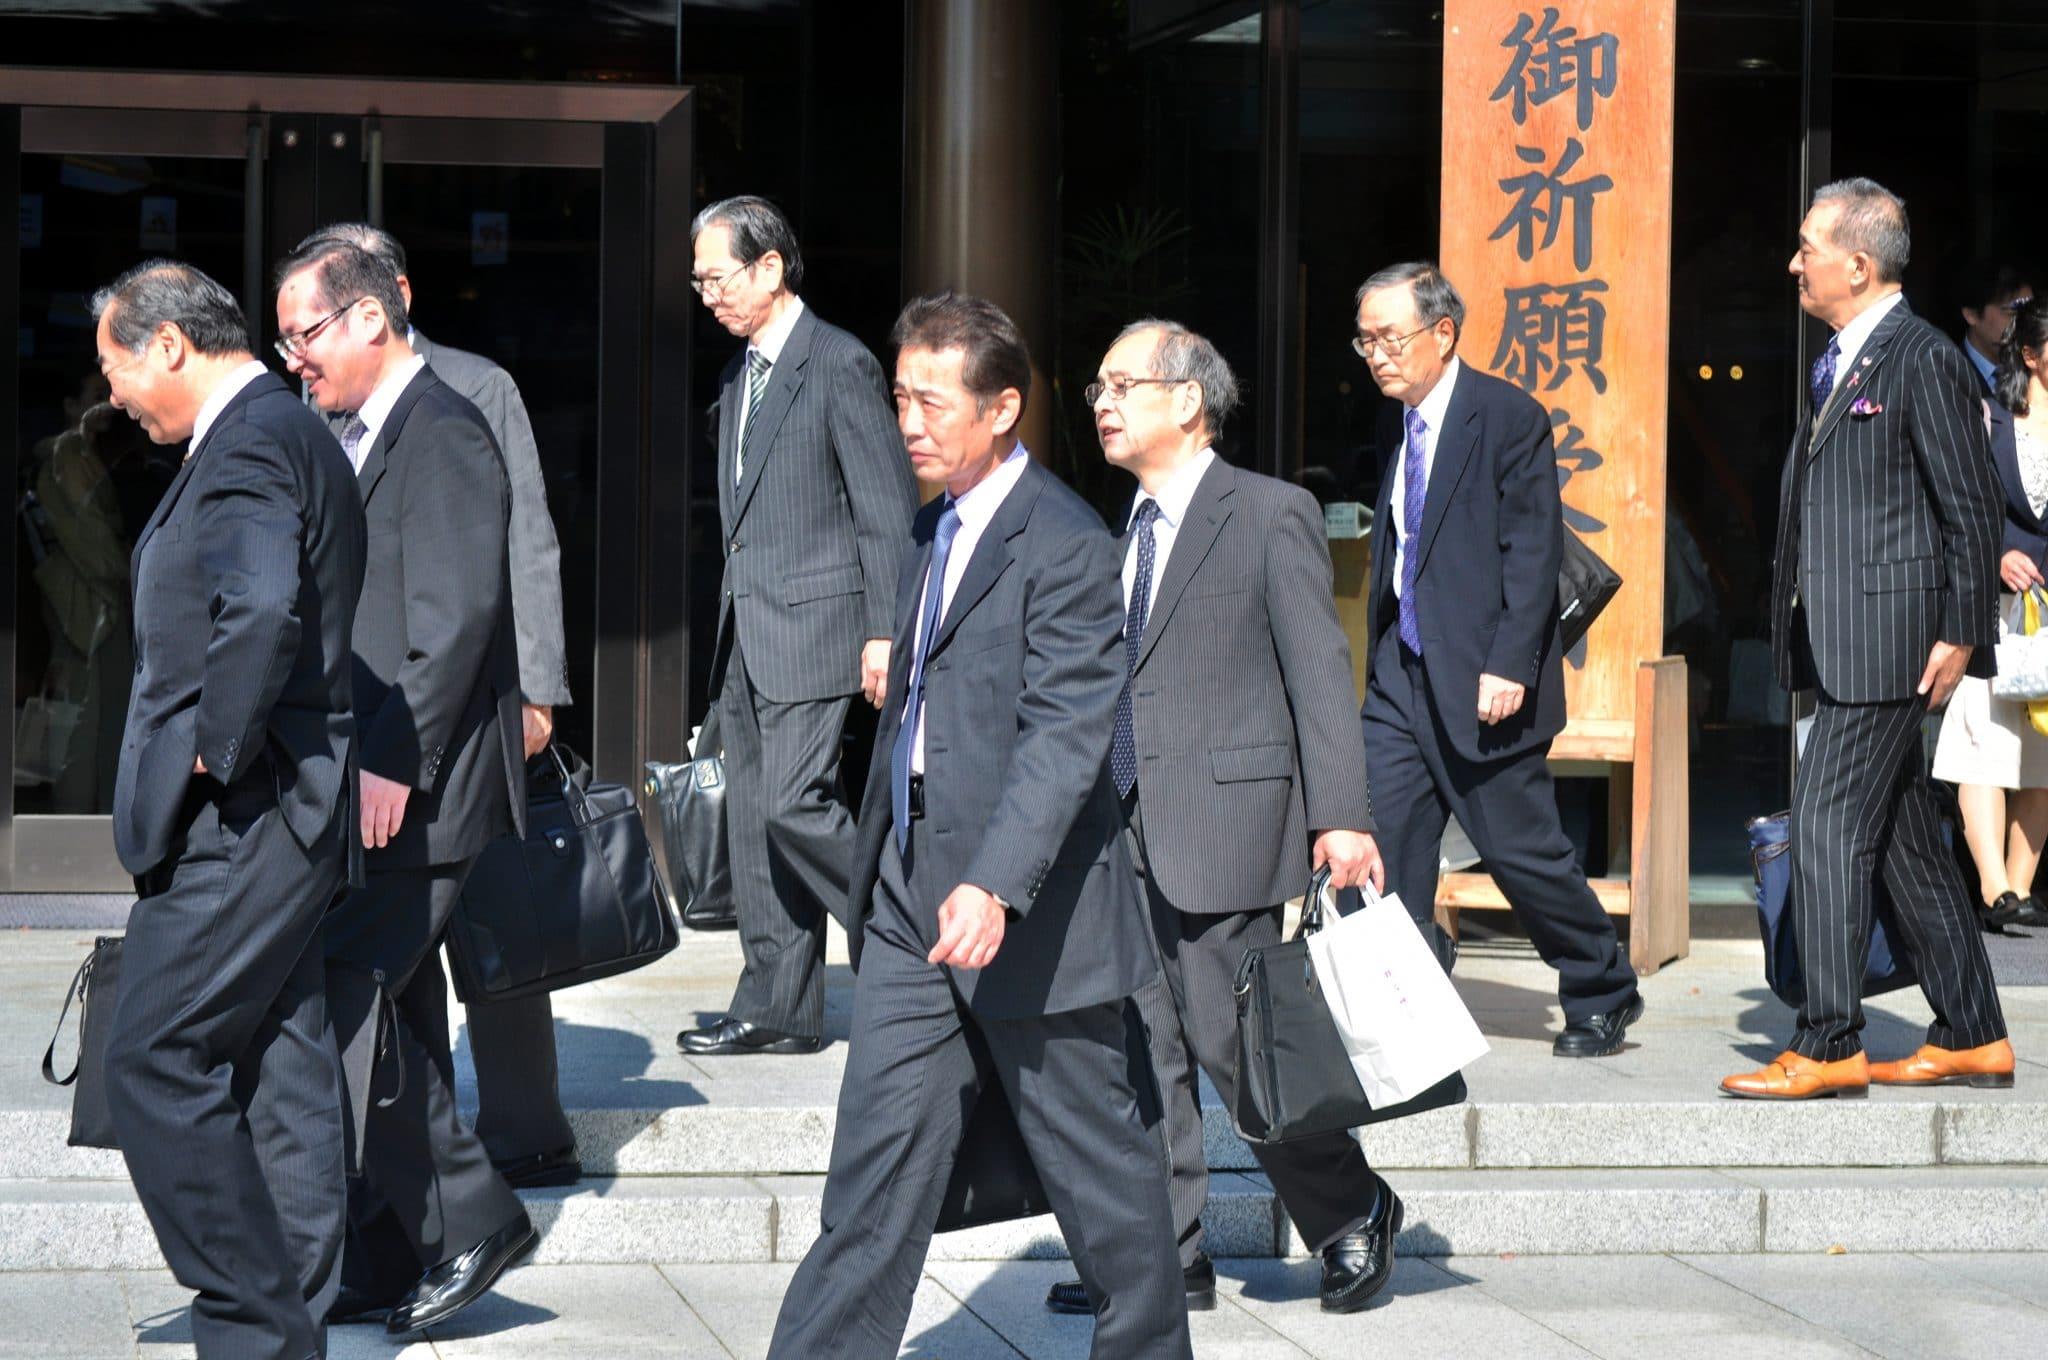 salaryman-travail-a-tokyo